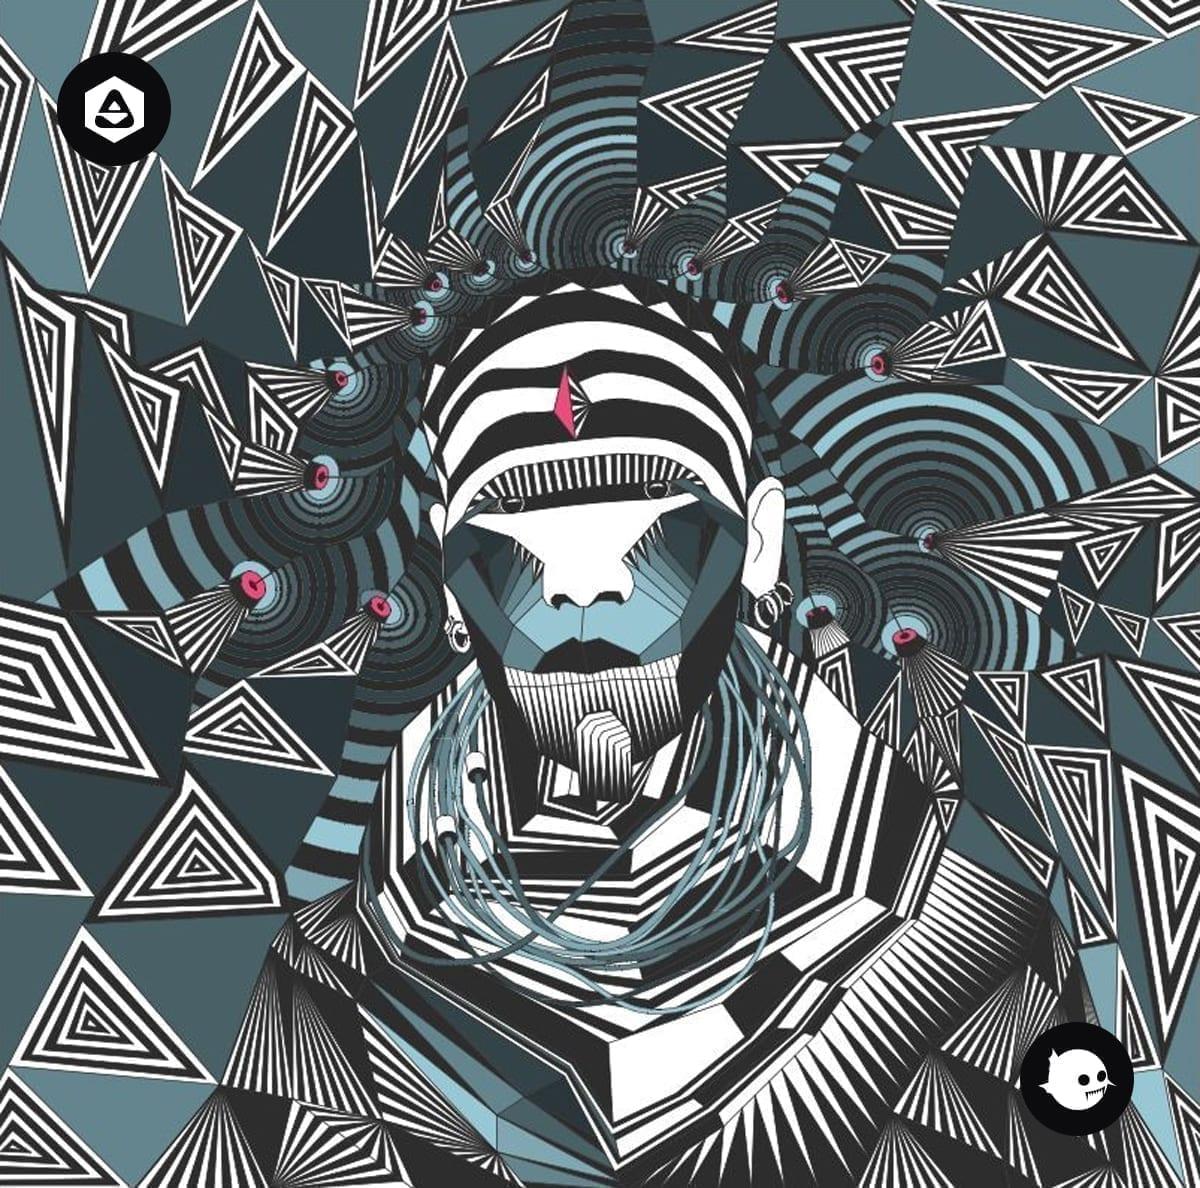 Macarie - Low Pawz [Kontent] 01